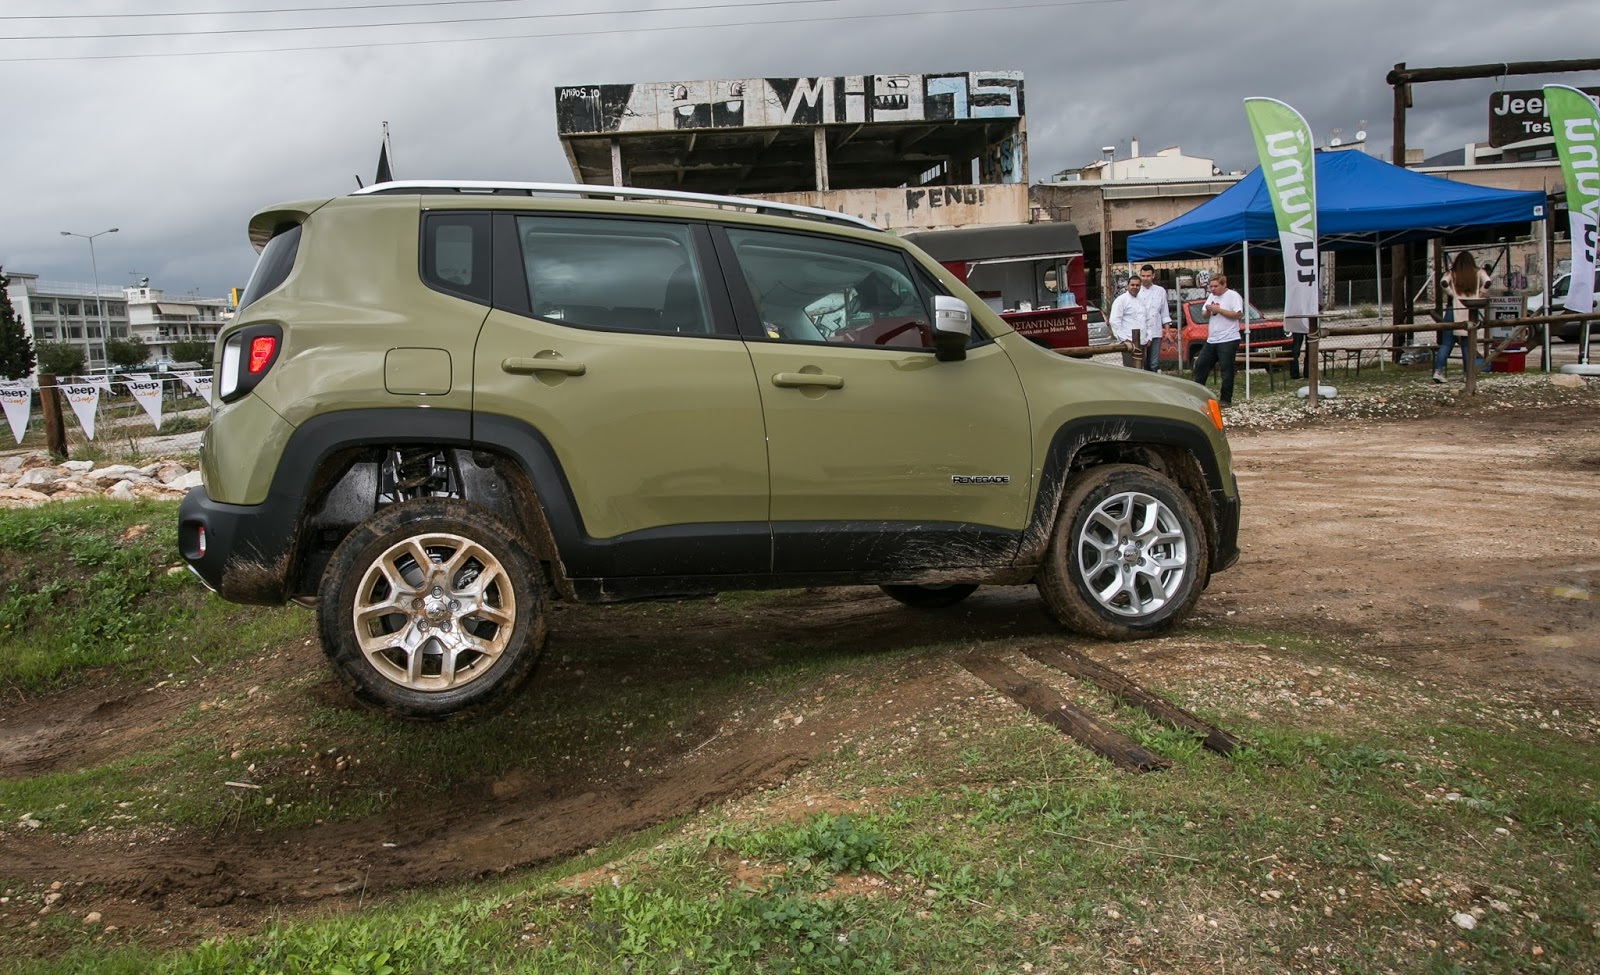 JEEP%2BCAMP GK 0427 Πετάμε ένα Jeep Renegade σε λάσπες, πέτρες, άμμο, λίμνες. Θα τα καταφέρει;